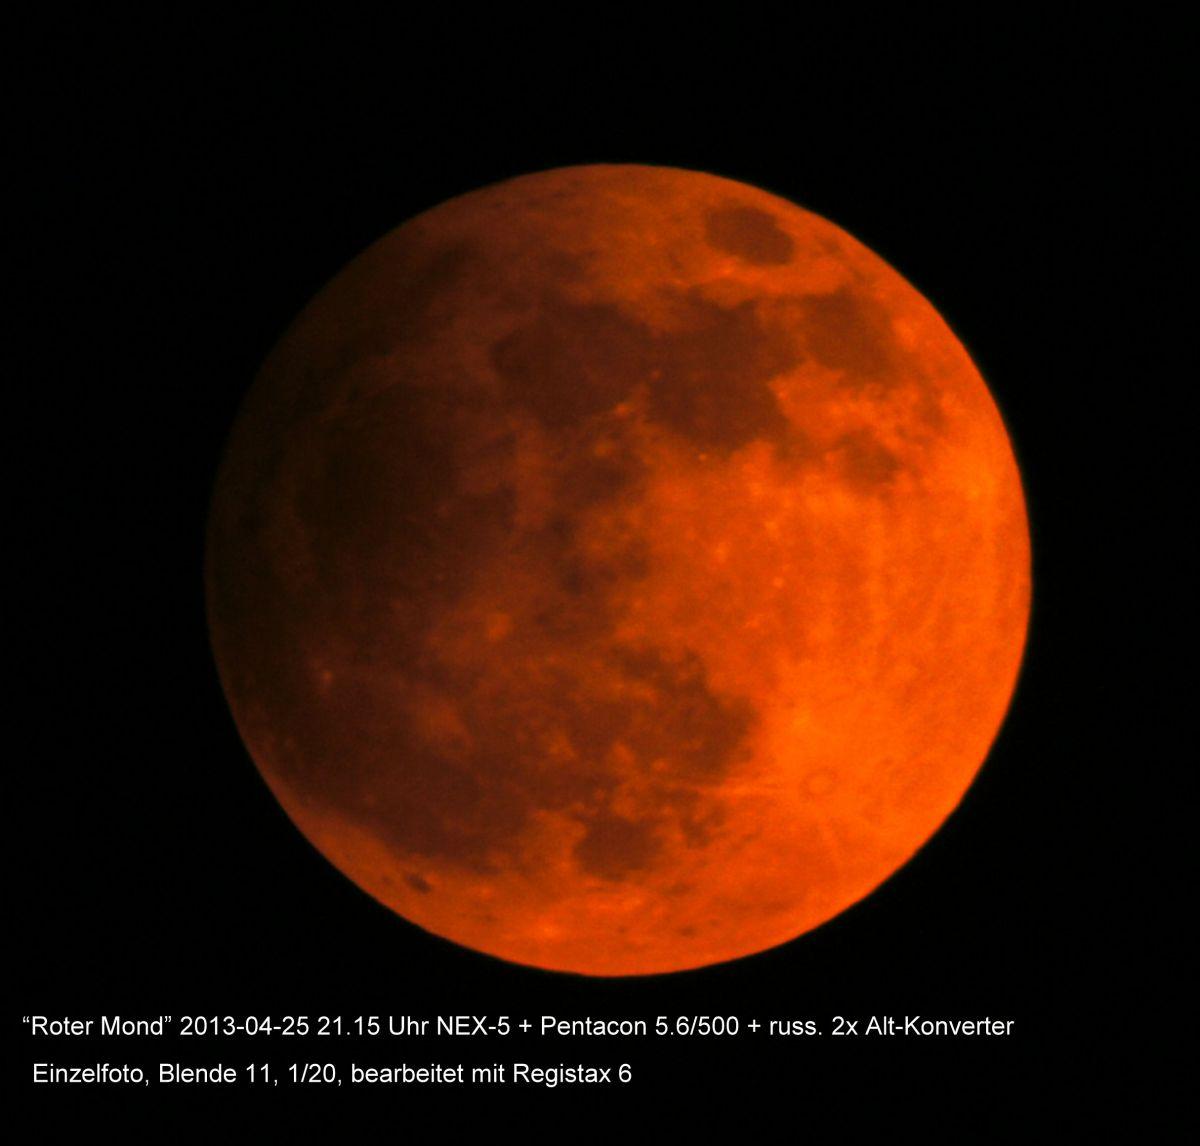 2013-04-25 Mond P 500.jpg